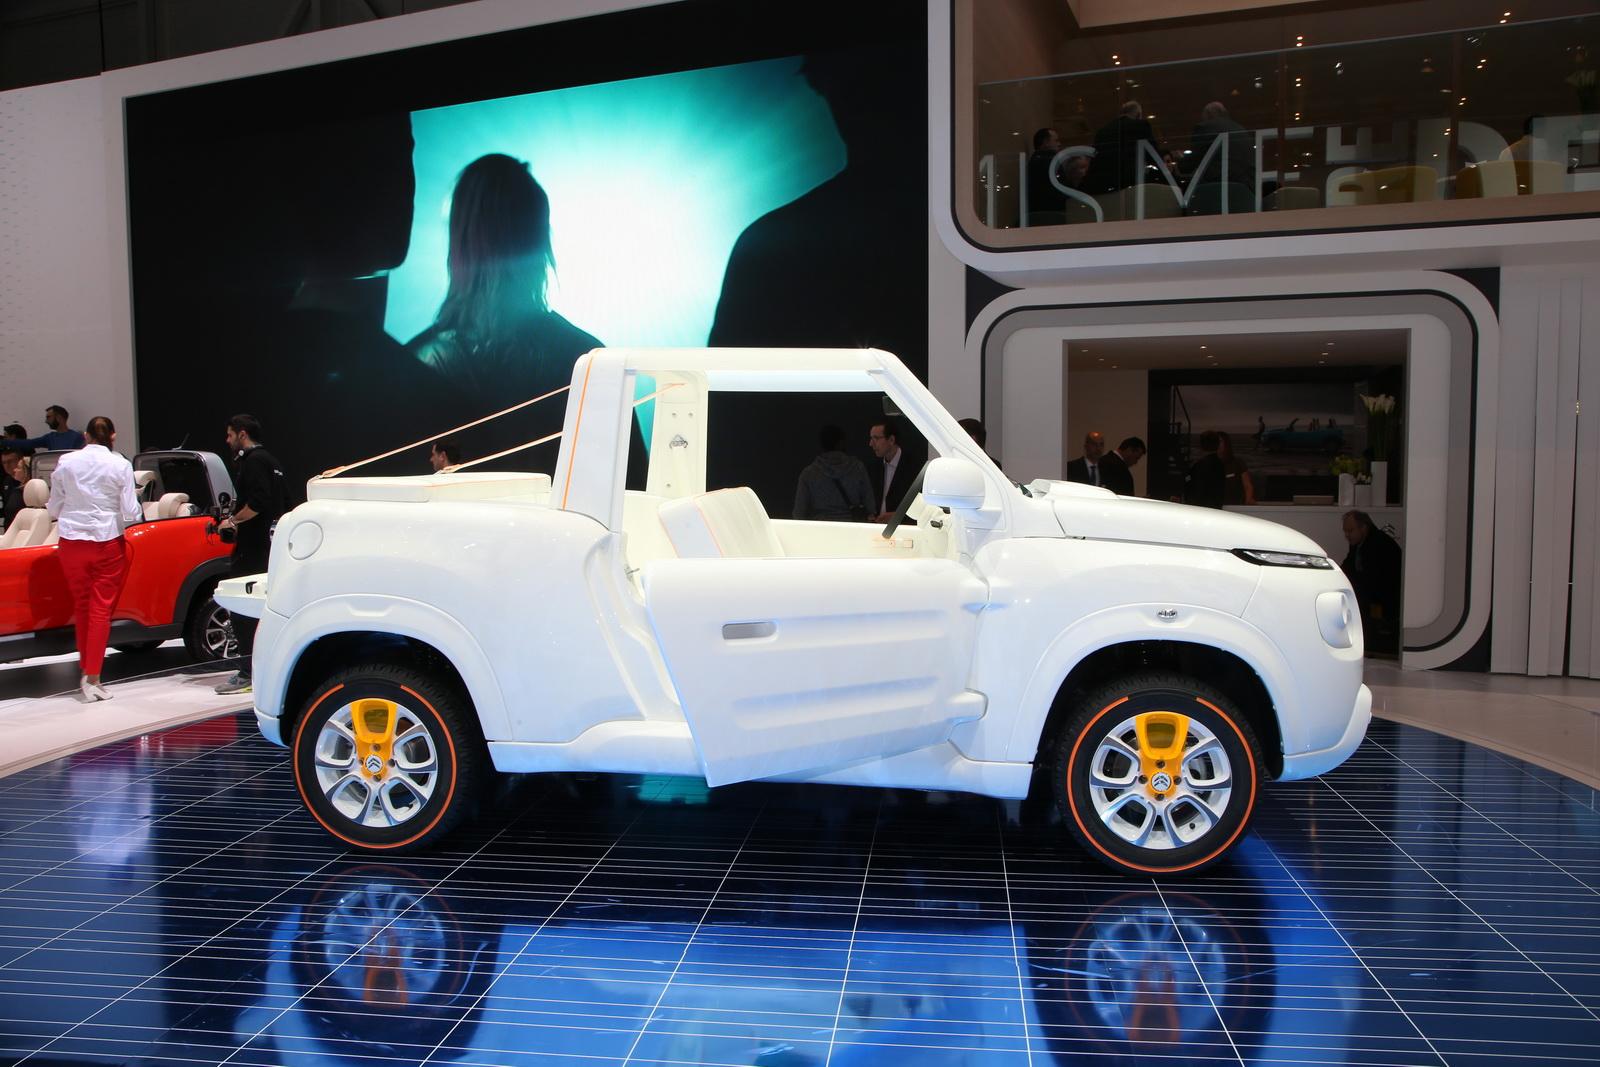 Citroen E-Mehari 2017 - Quái vật ngoài hành tinh tại Geneva Motor Show 2016